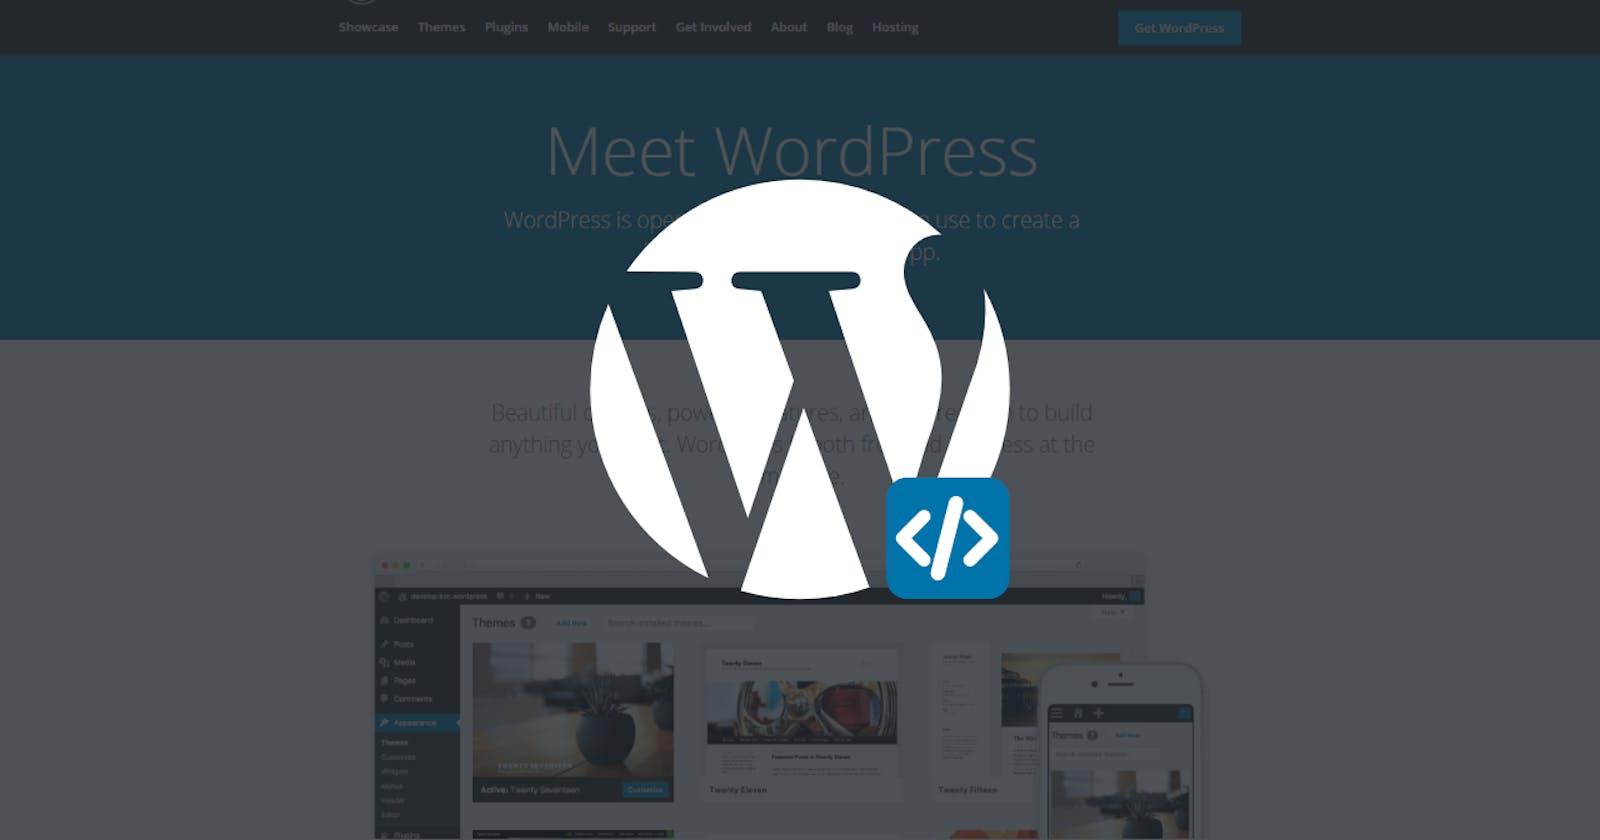 Execute PHP code in WordPress